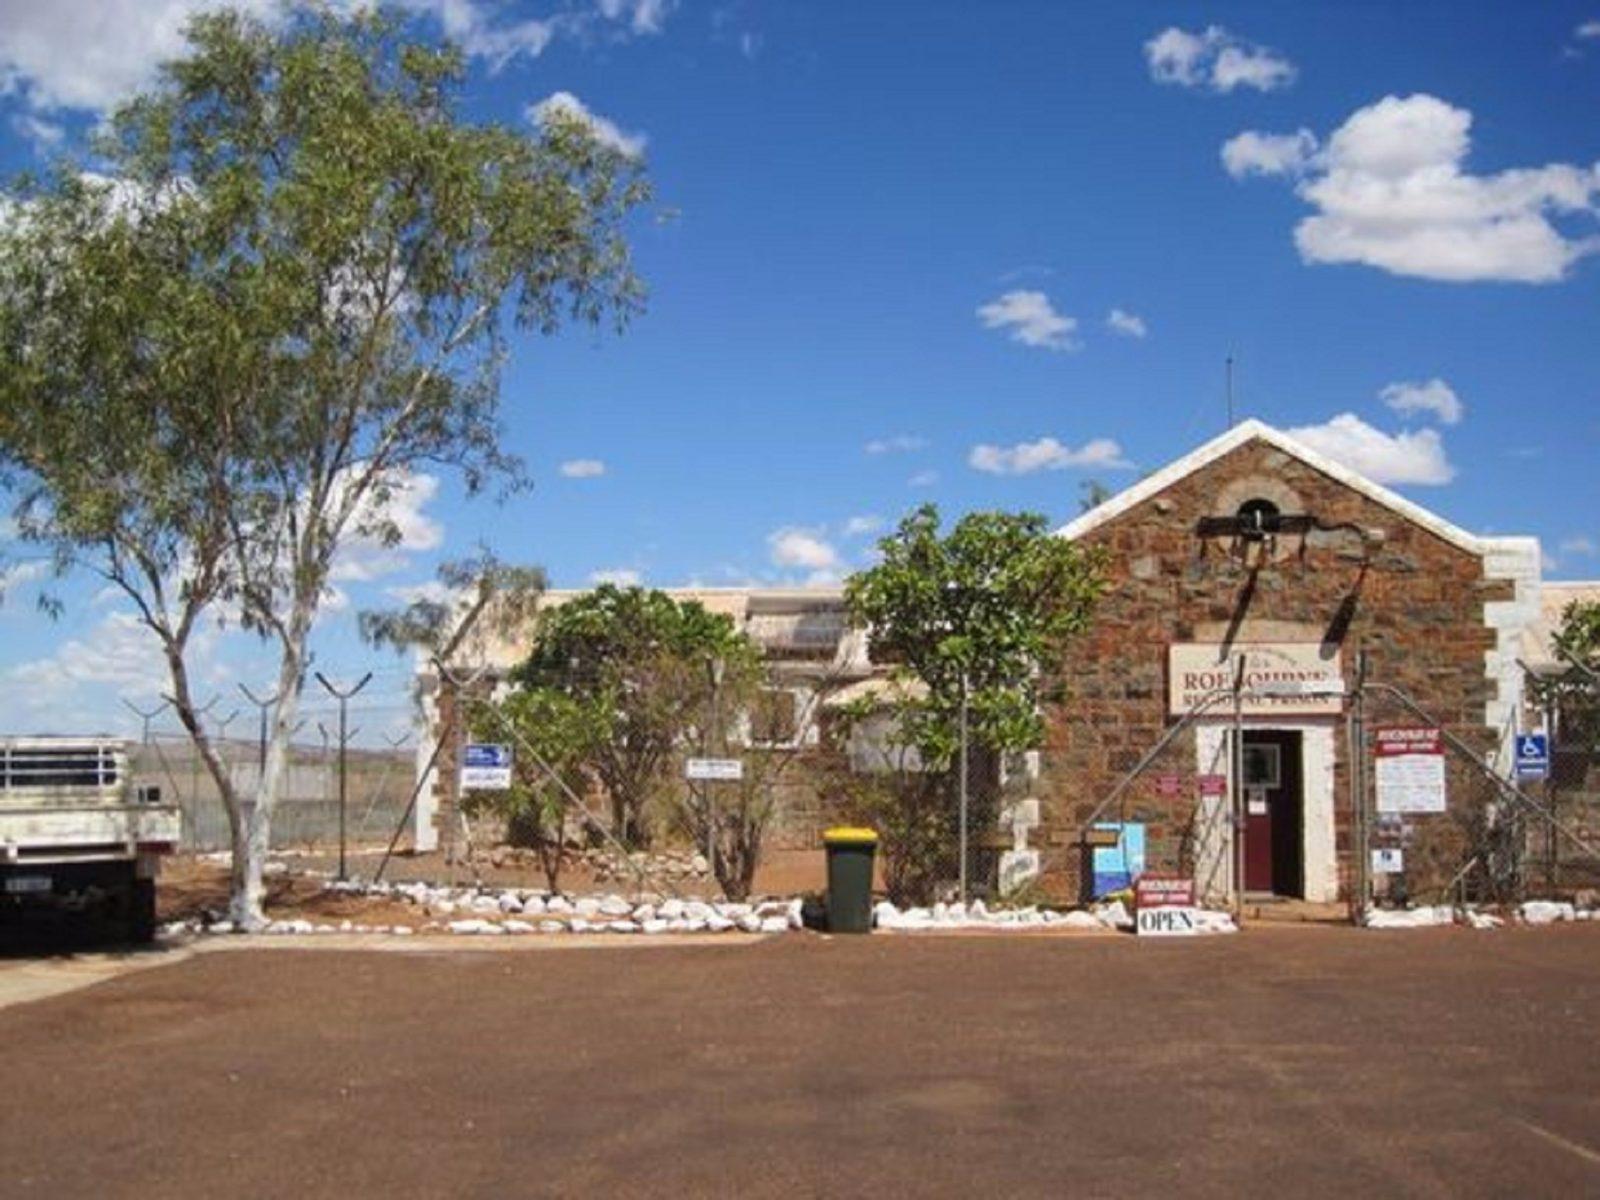 Roebourne Visitor Centre, Roebourne, Western Australia